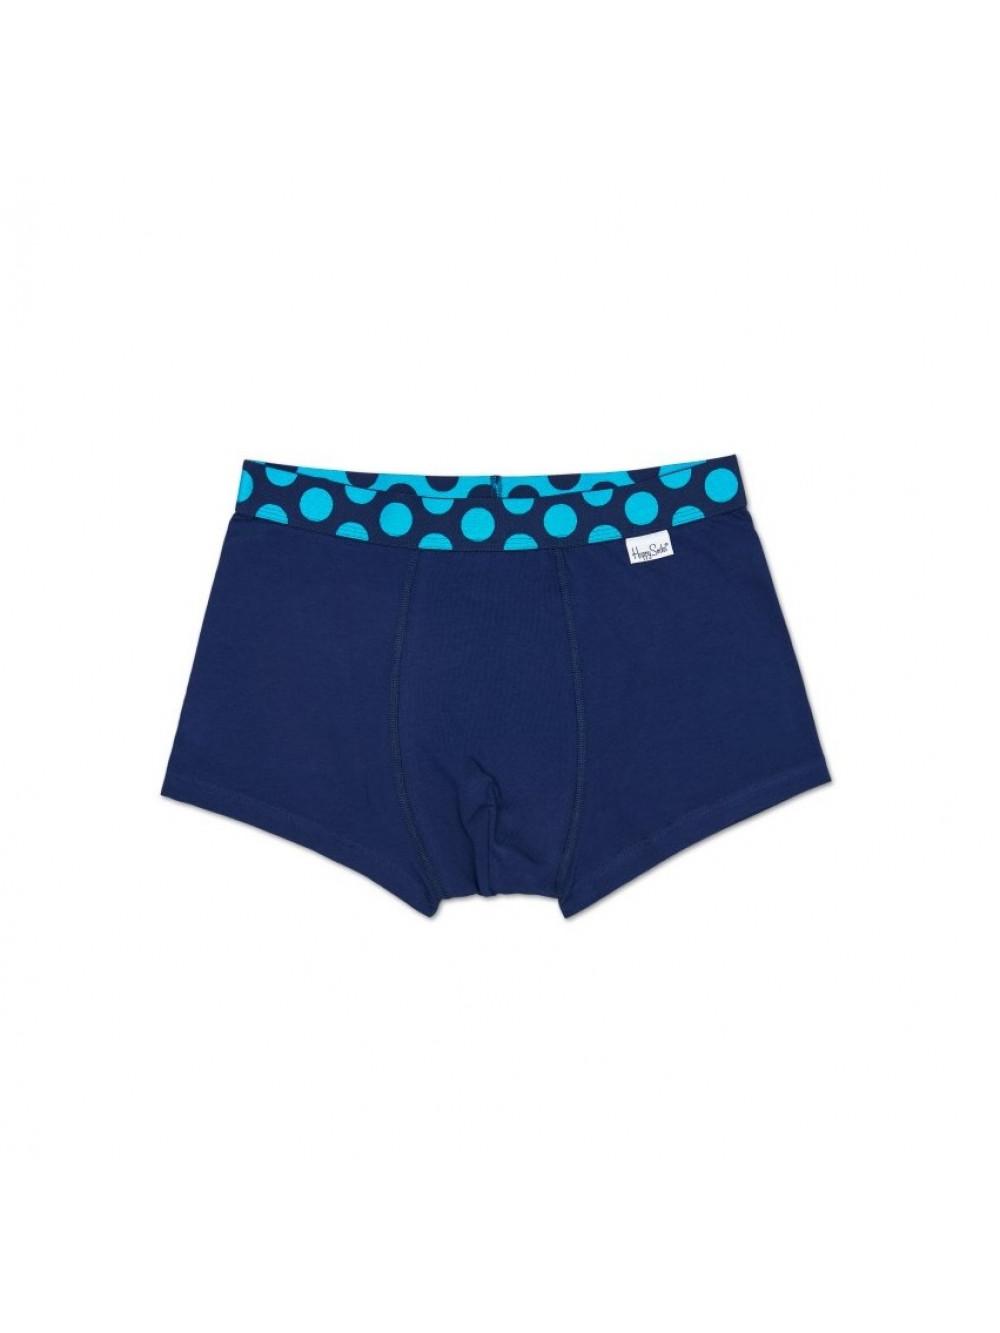 Boxerky Happy Socks Pop Color - tmavomodré